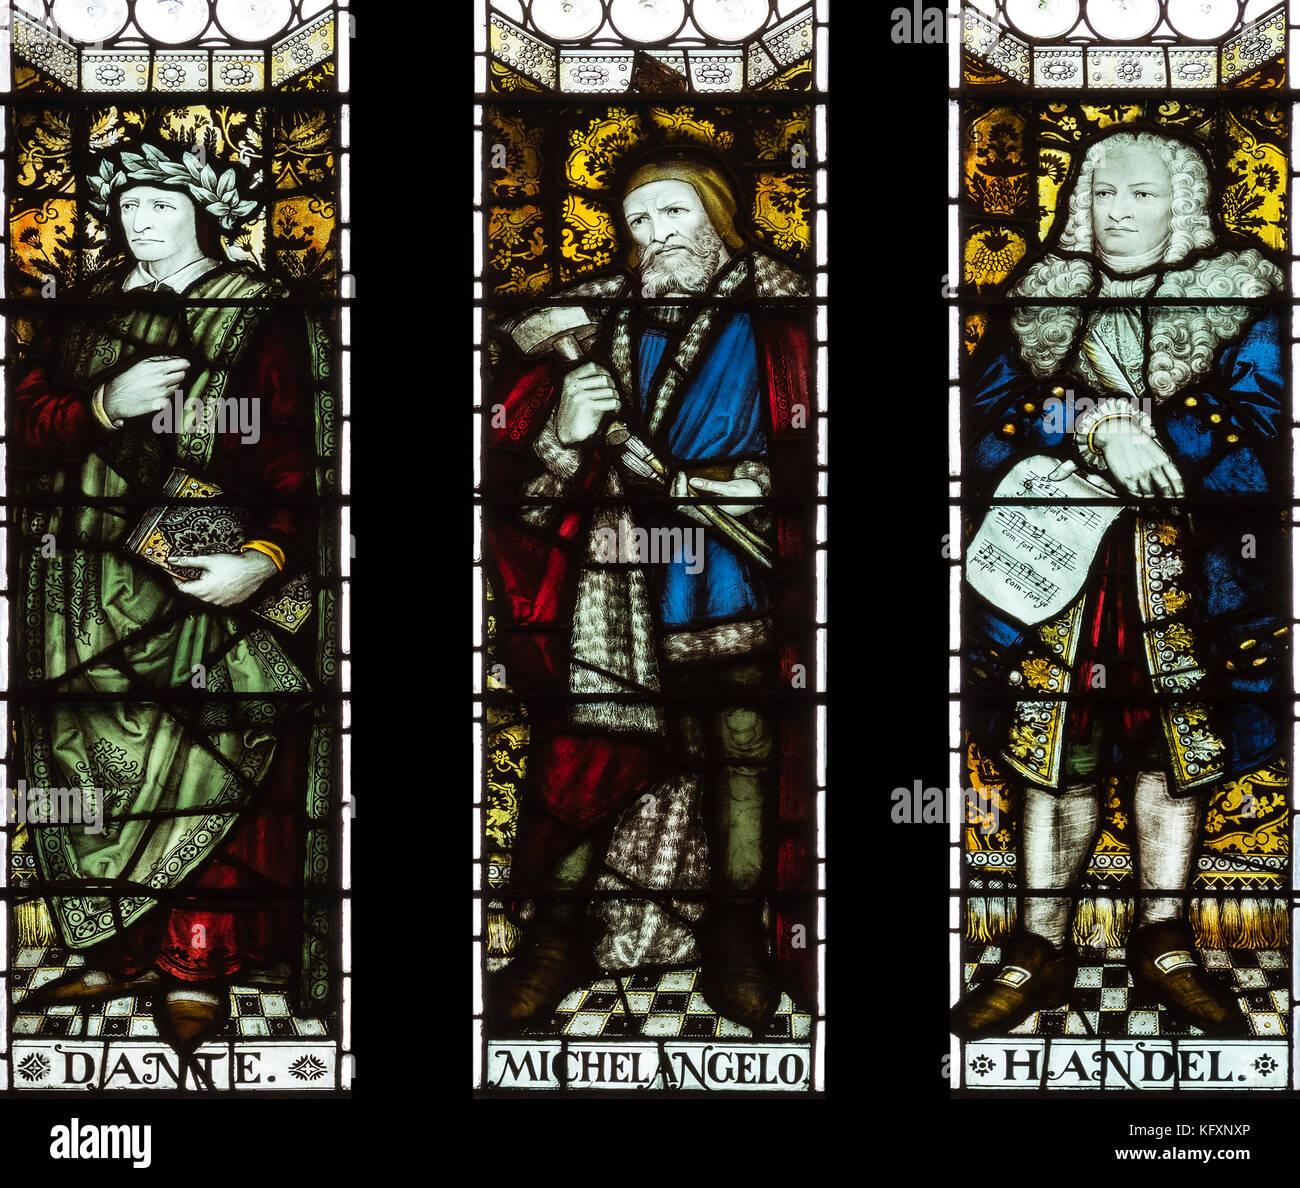 Berühmte europäische 'Künstler' aus früheren Jahrhunderten gefeiert in der John Rylands Stockbild